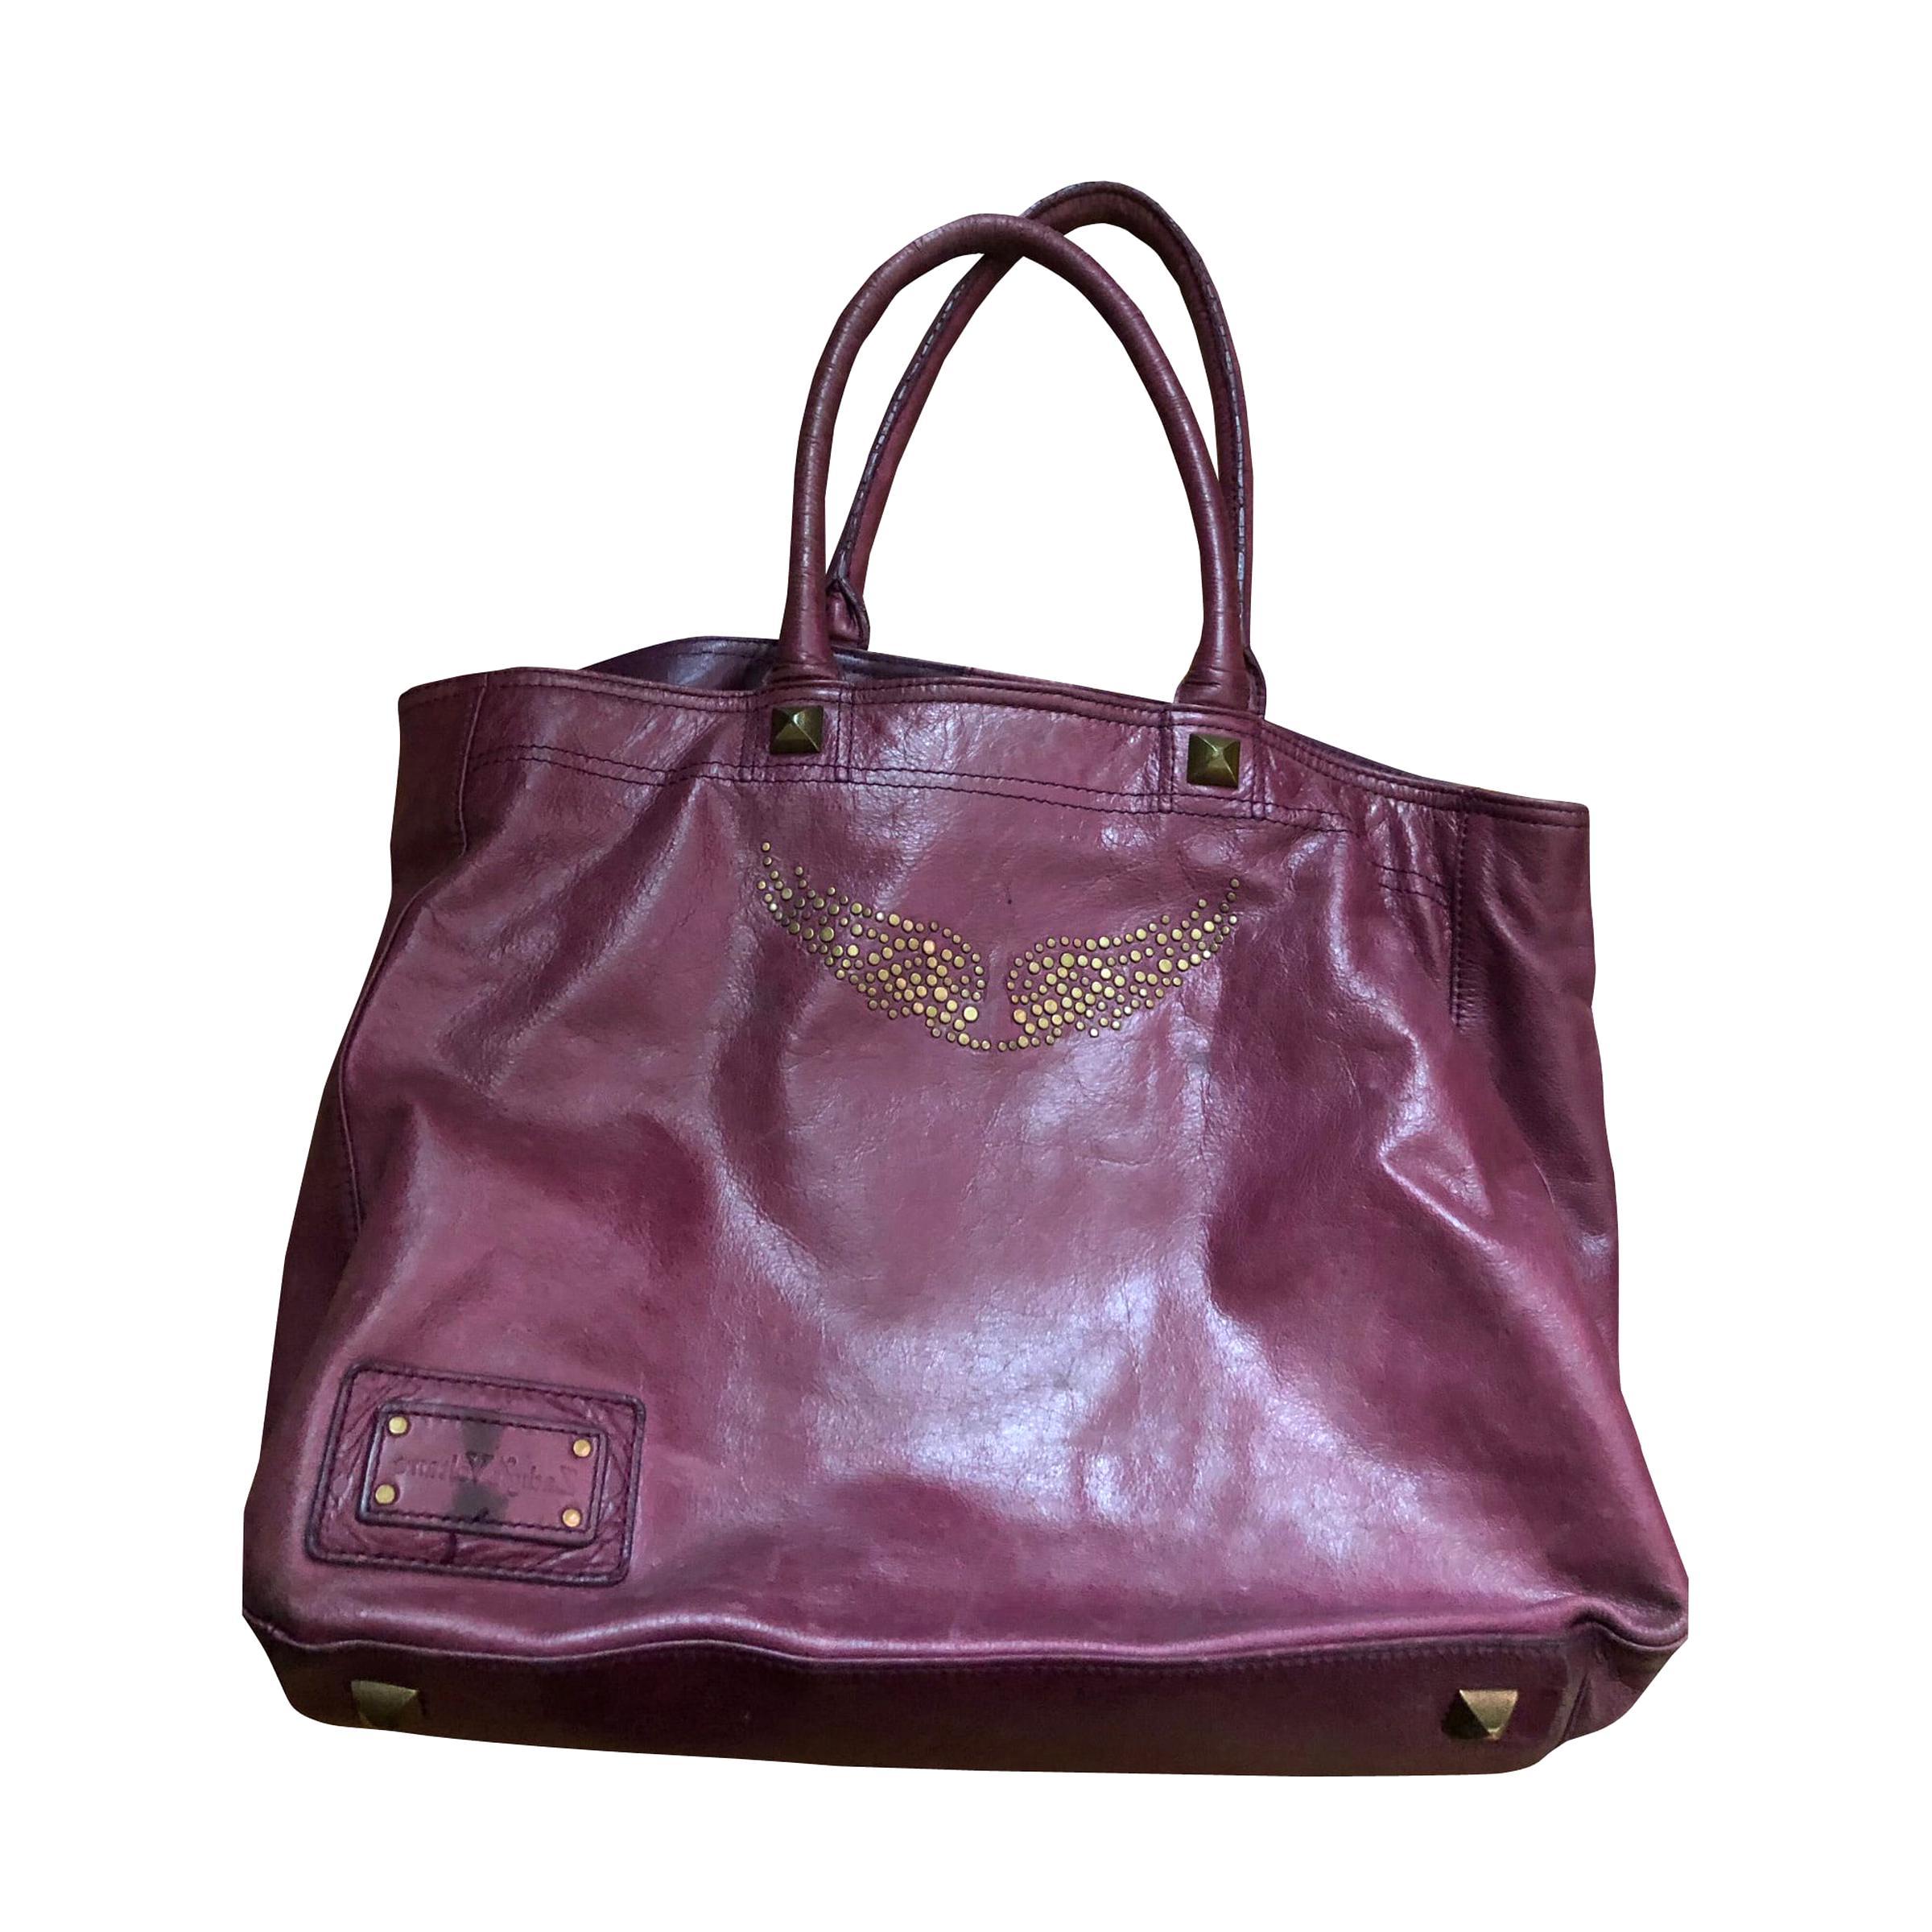 sac zadig voltaire violet d'occasion